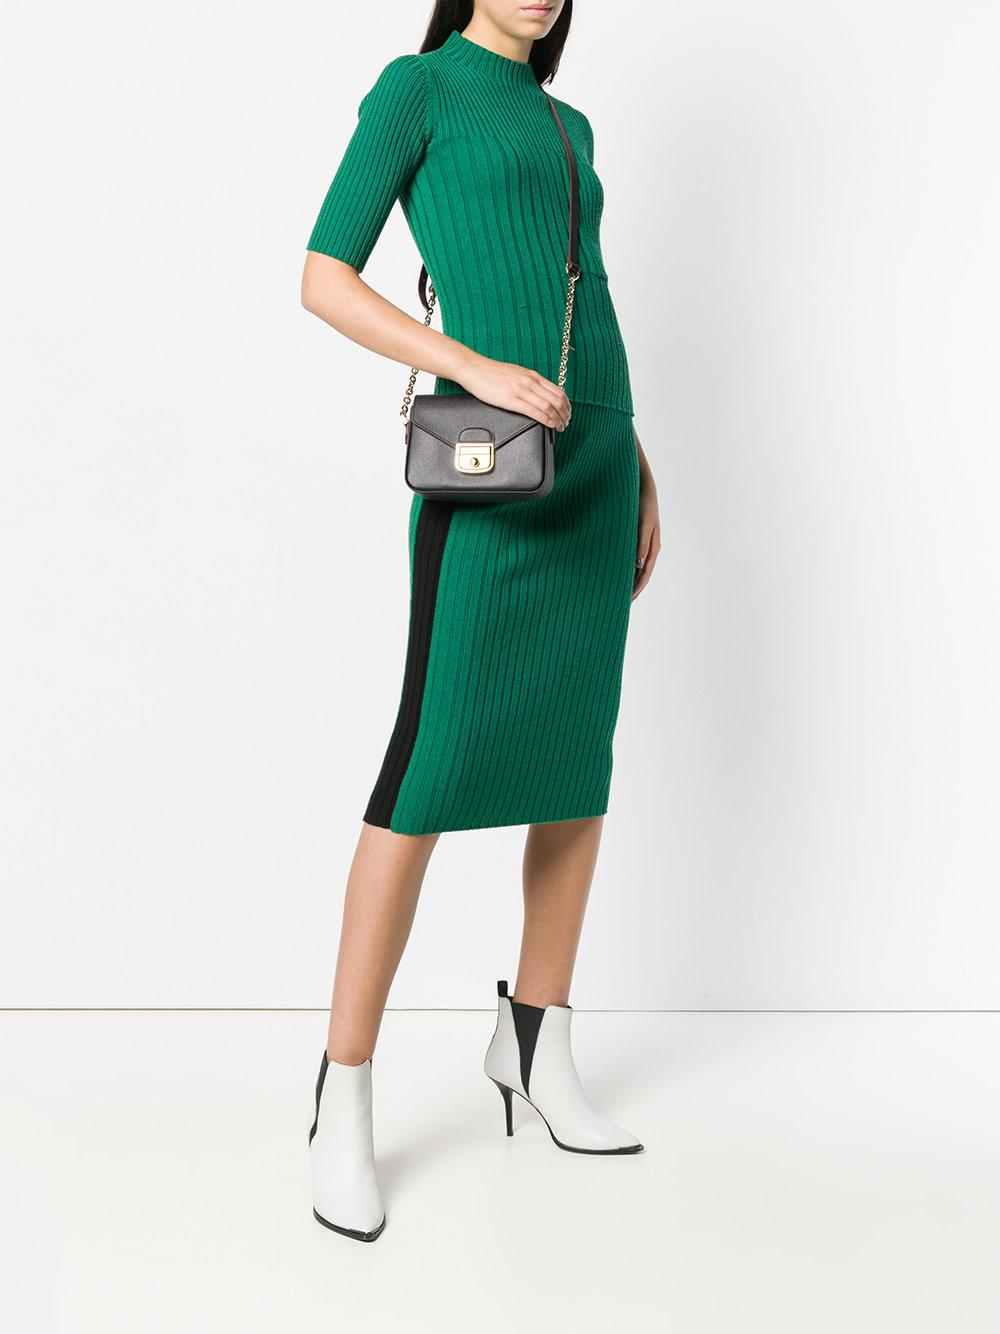 Longchamp Leather Metallic Chain Crossbody Bag in Black